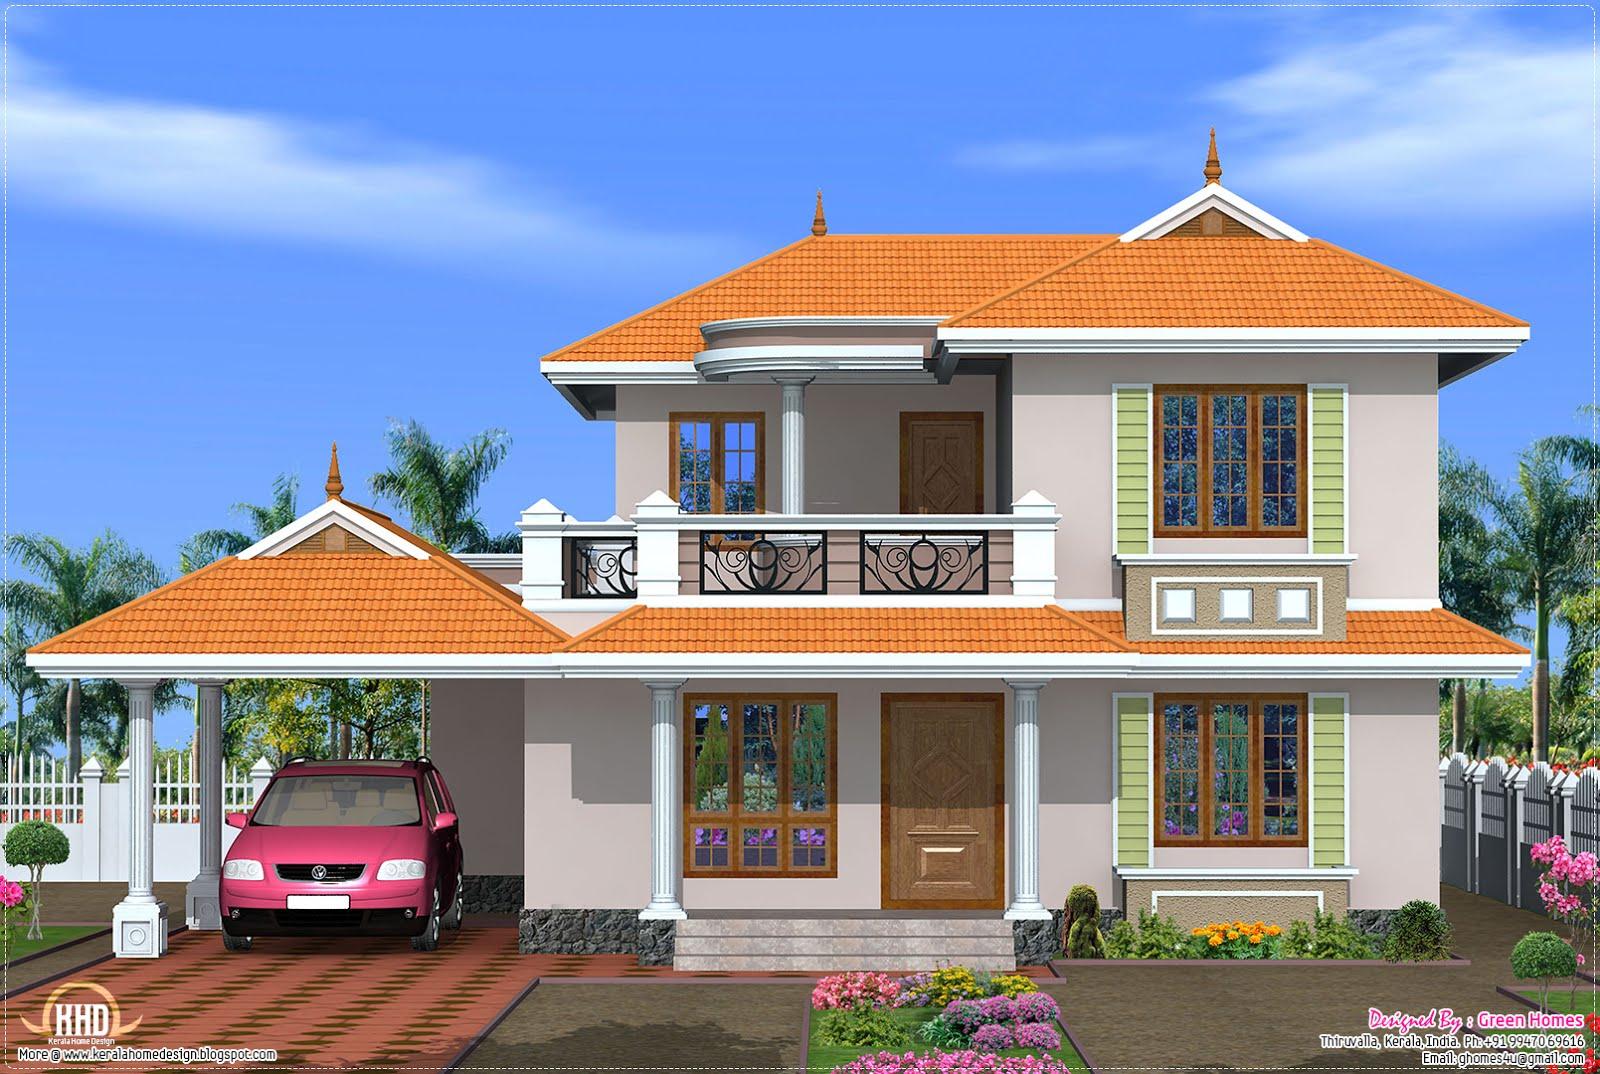 Window Models For Houses - Home Design Inside